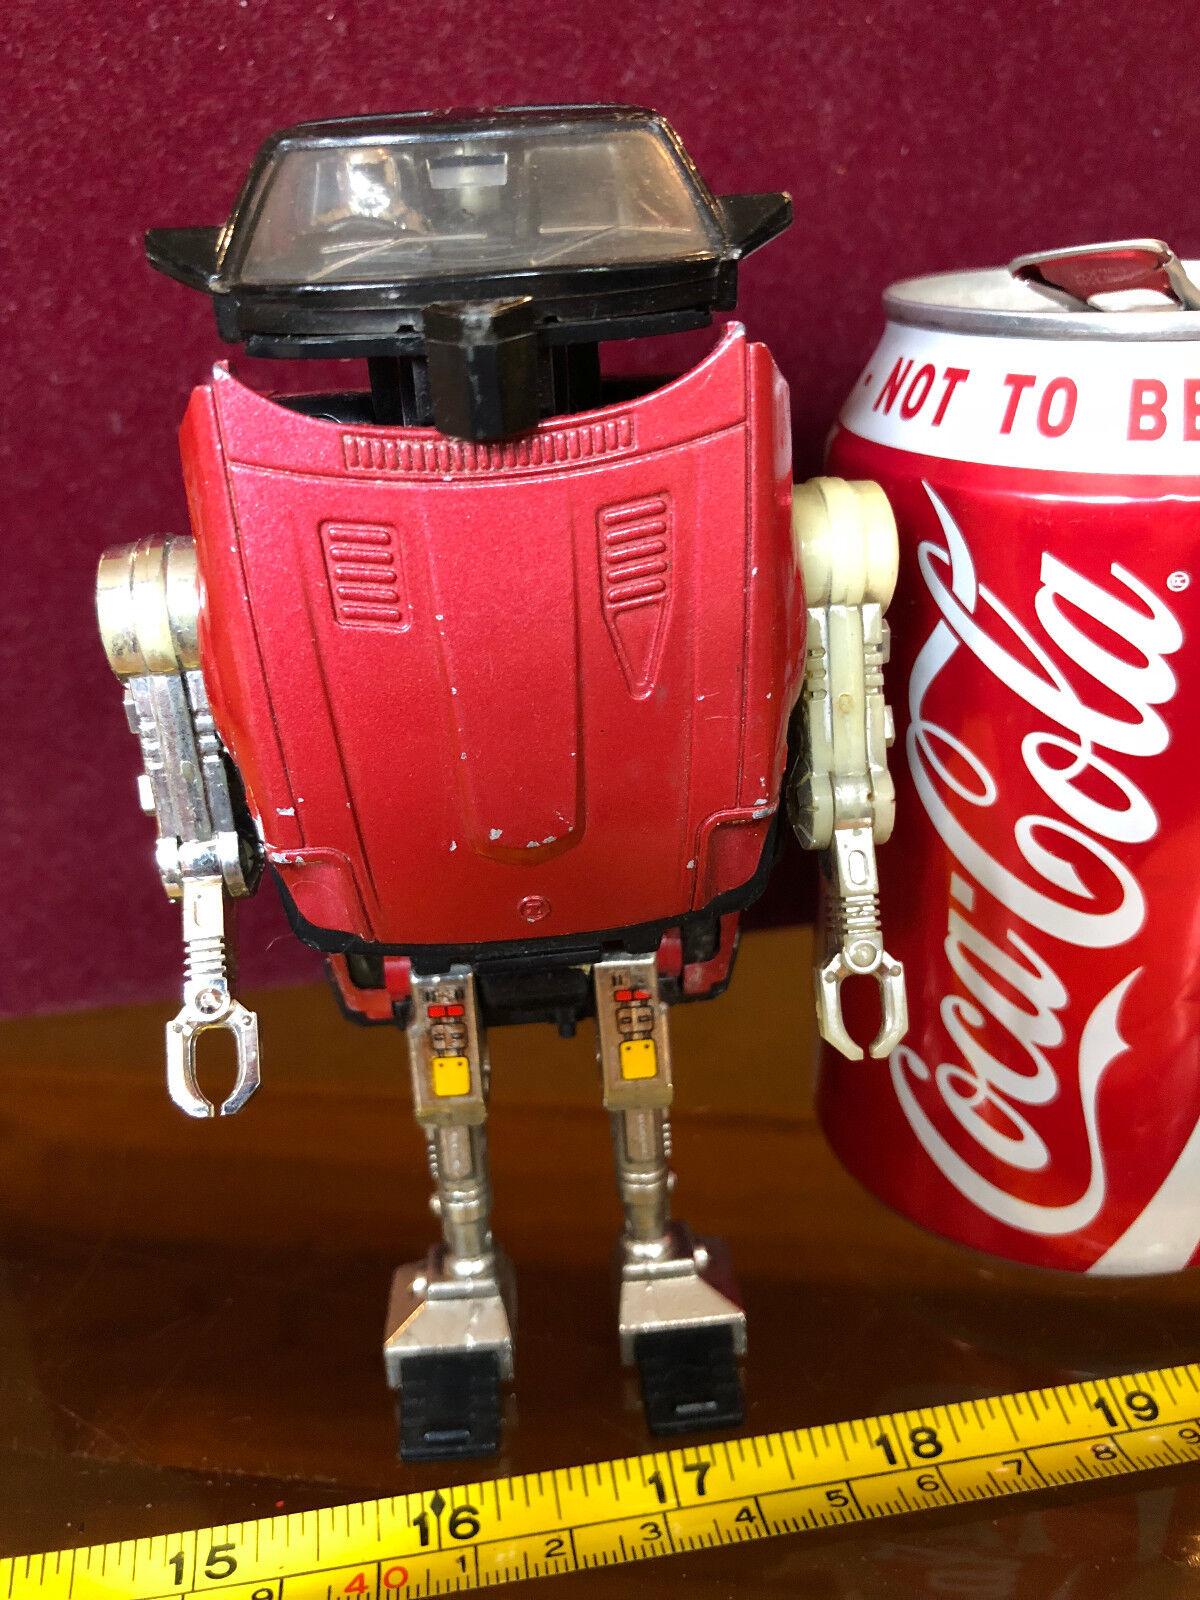 Gobot fairlady rotes auto popy transformatoren selten hasbro 1983 original